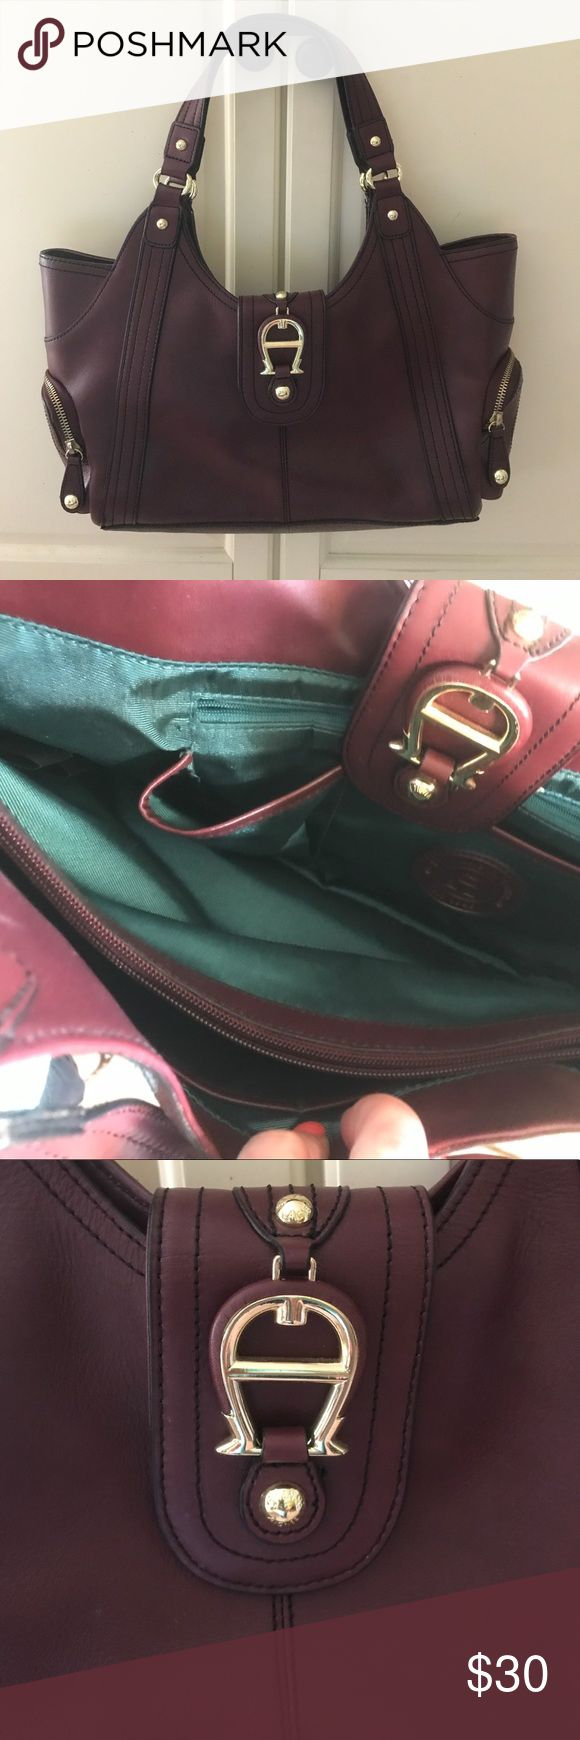 Aigner handbag Etienne Aigner handbag Etienne Aigner Bags Satchels